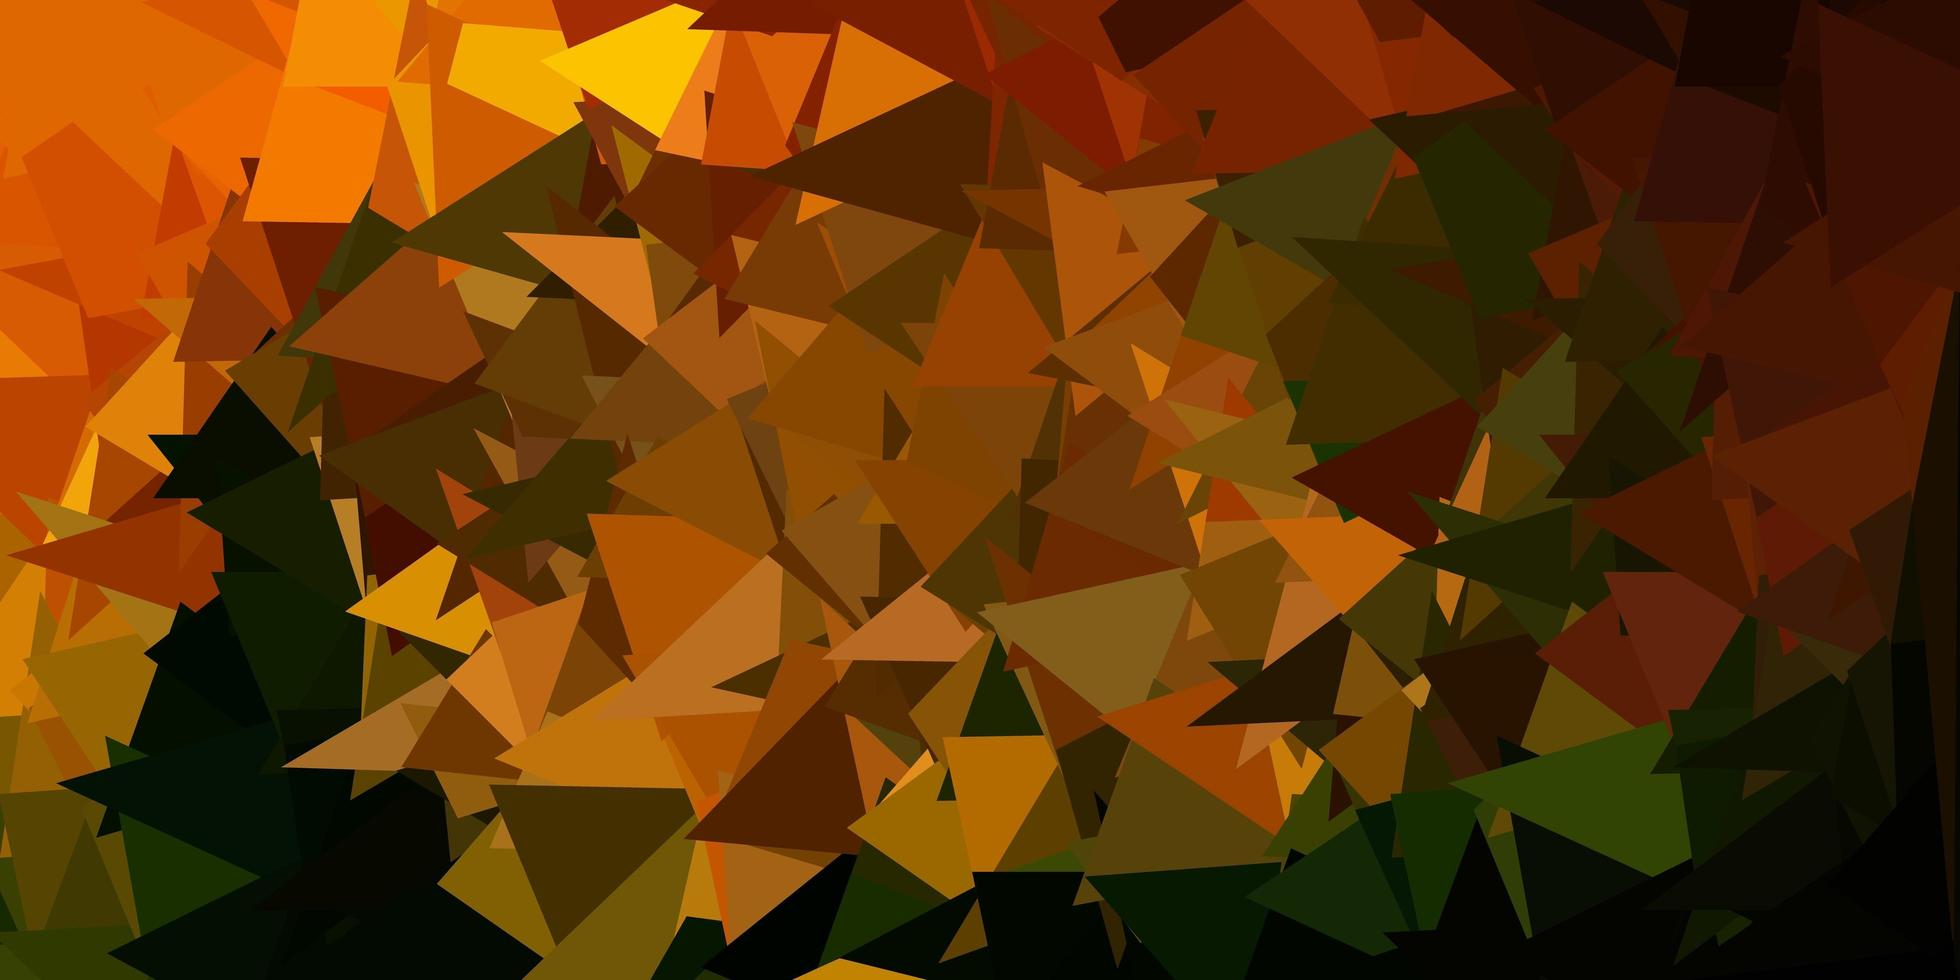 mörkgrön, gul vektor abstrakt triangelbakgrund.